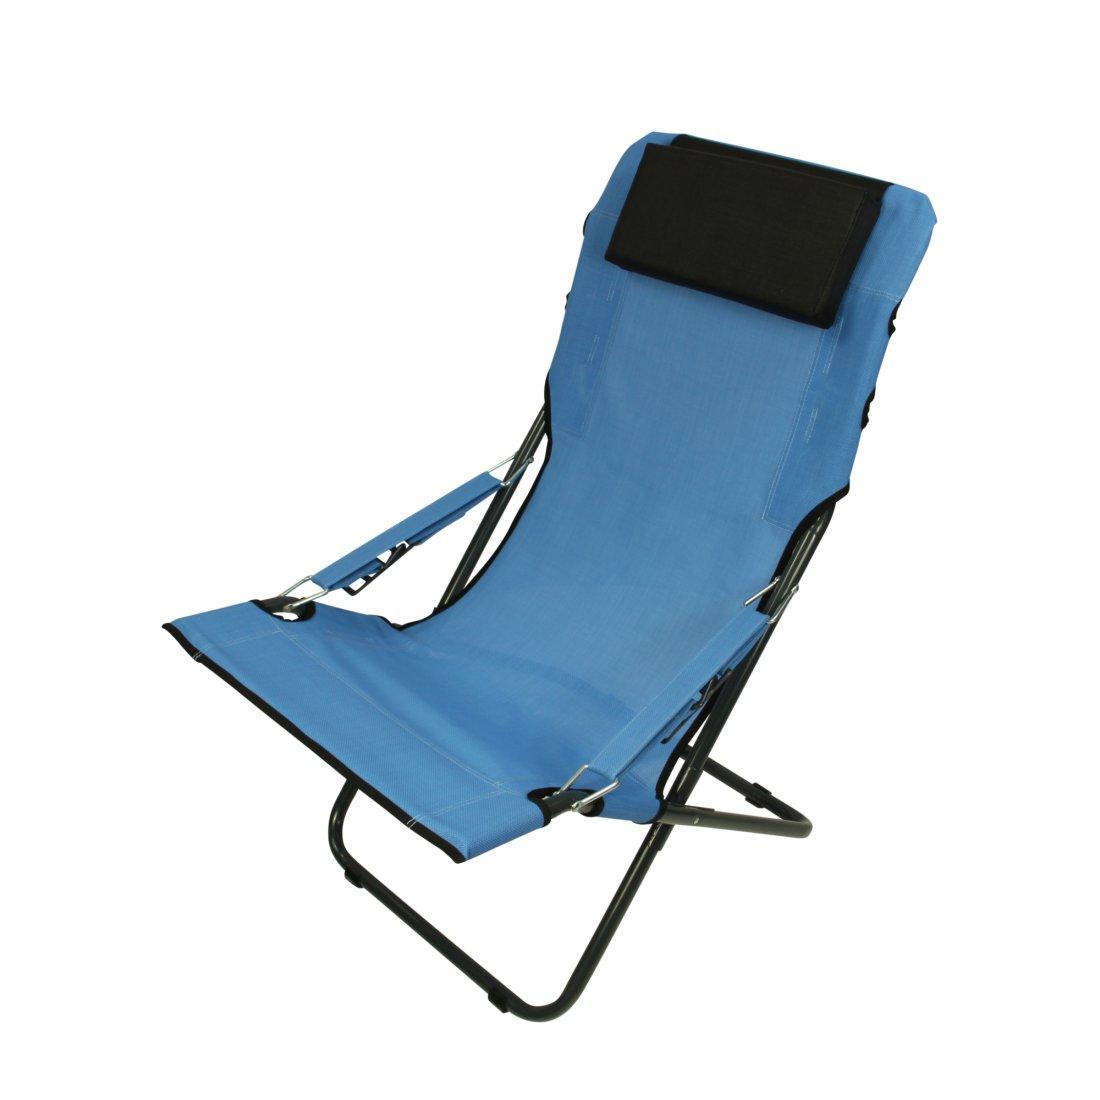 Fridani RCB 100 Camping Chair Garden Chair With Head Cushion 4 Way Adjust